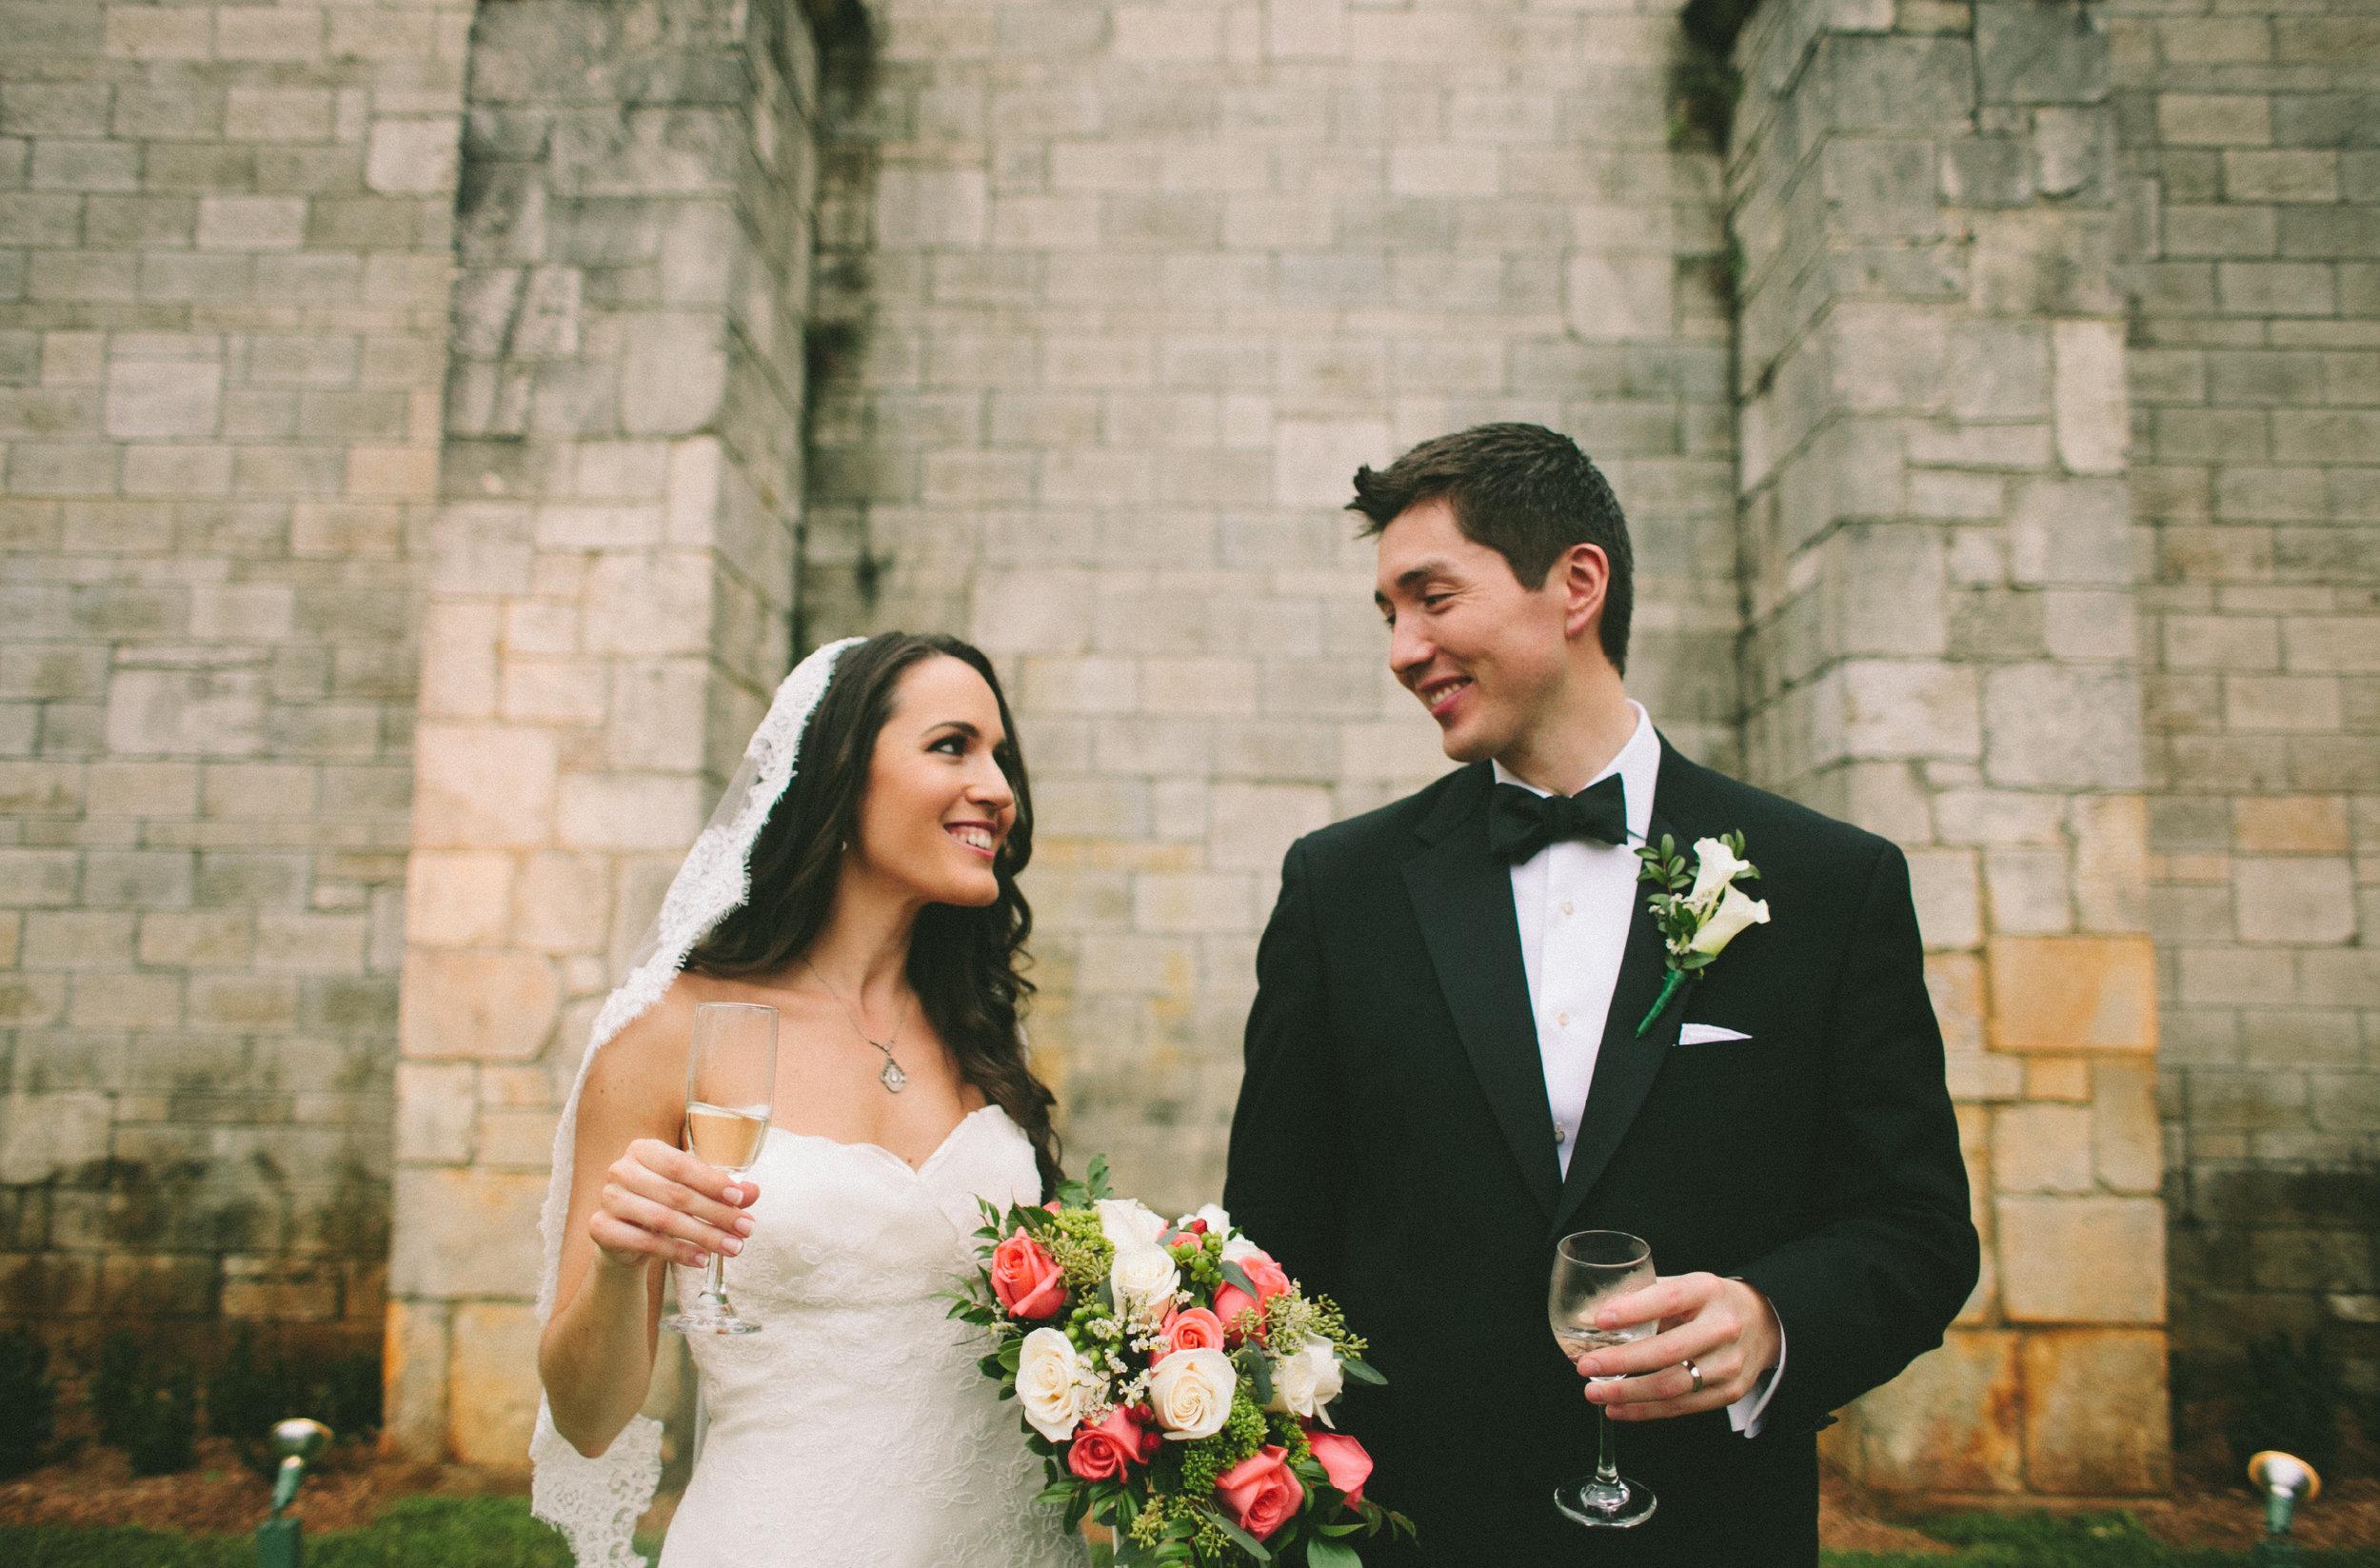 Wedding at the Spanish Monastery Miami Beach69.jpg